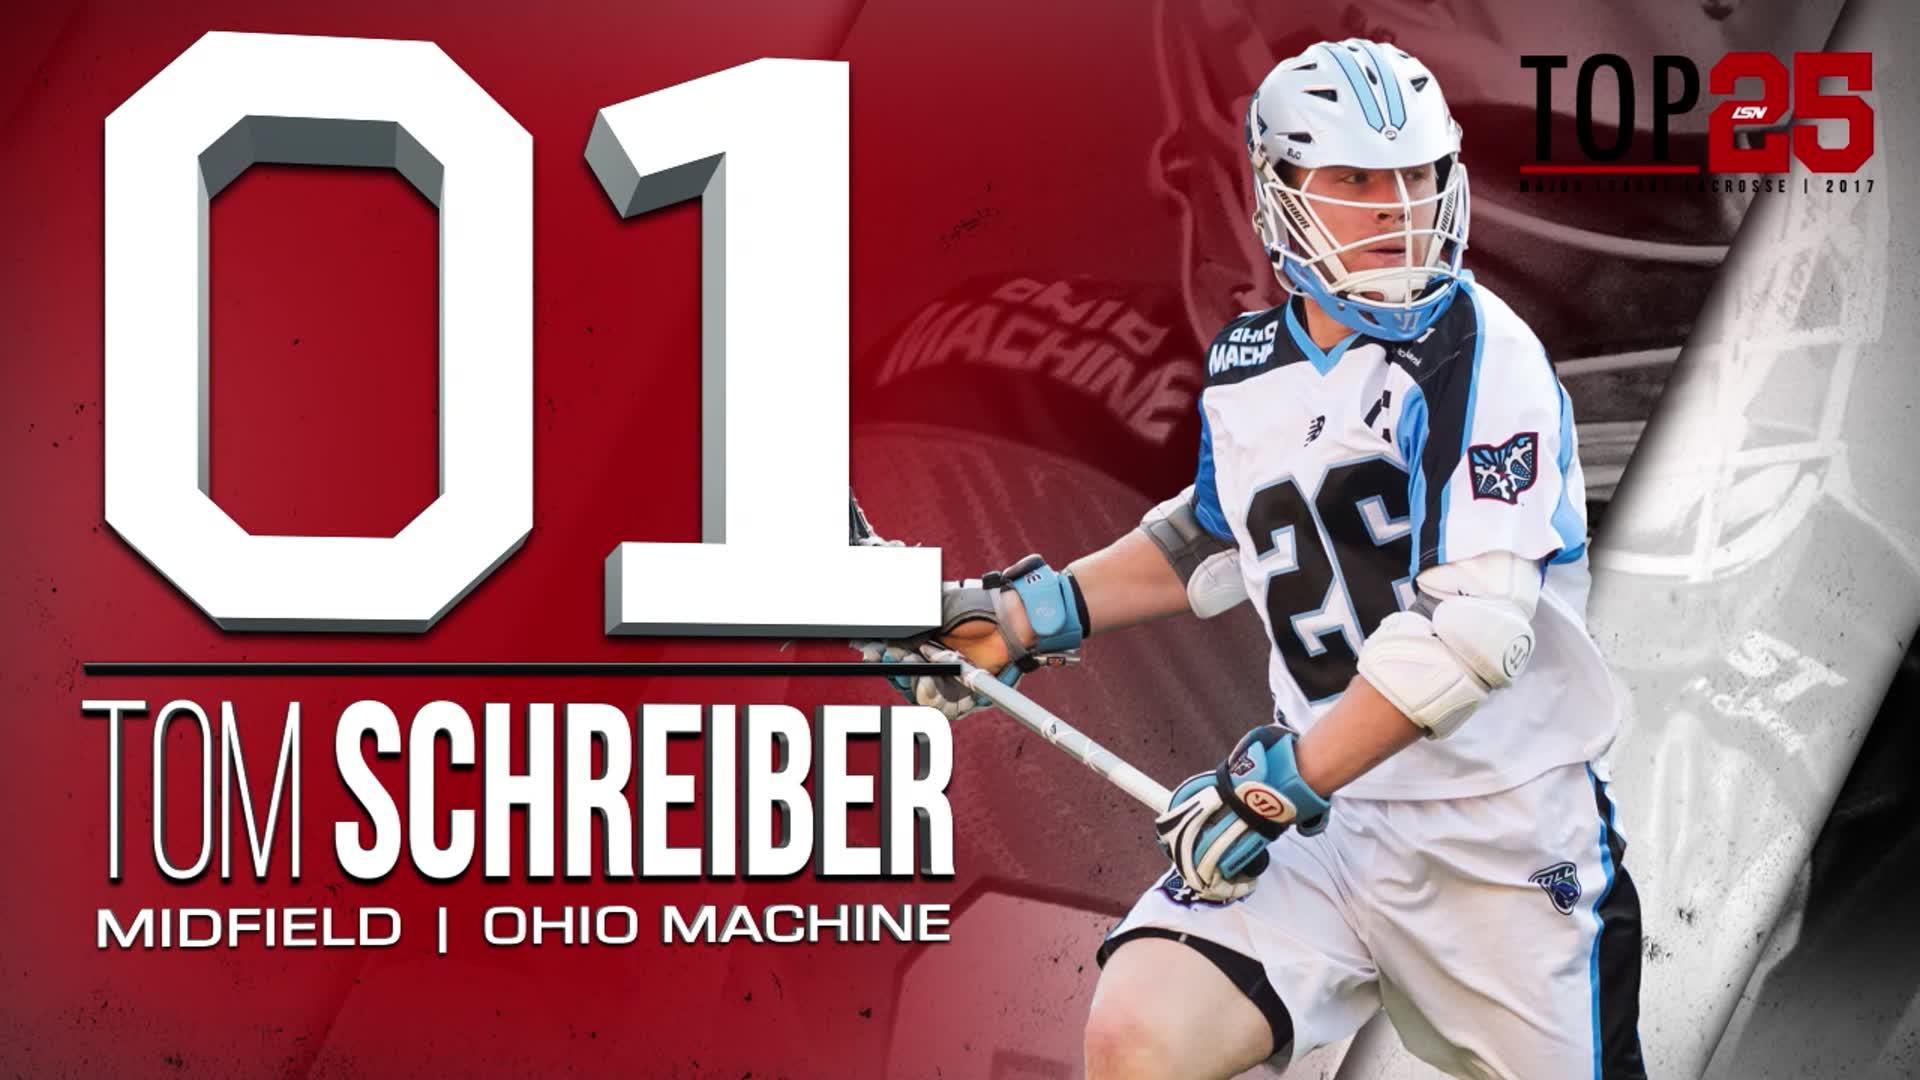 2017 #MLLTop25 Number 1 Tom Schreiber